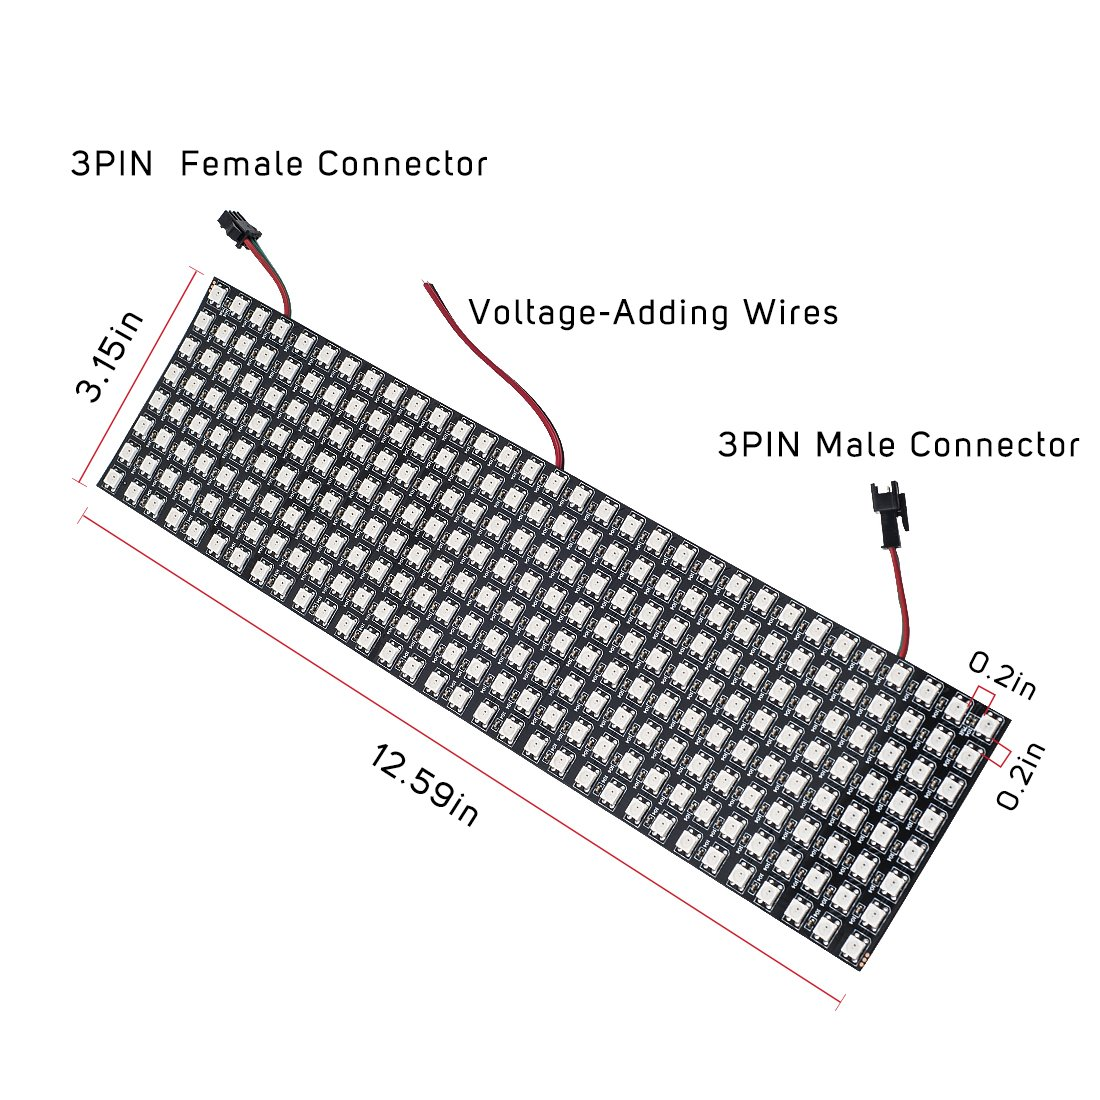 Btf Lighting 024ft096ft Pixel 256 Pixels Ws2812b Axl Guitar Wiring Diagram Digital Flexible Led Panel Individually Addressable Full Dream Color Dc5v Home